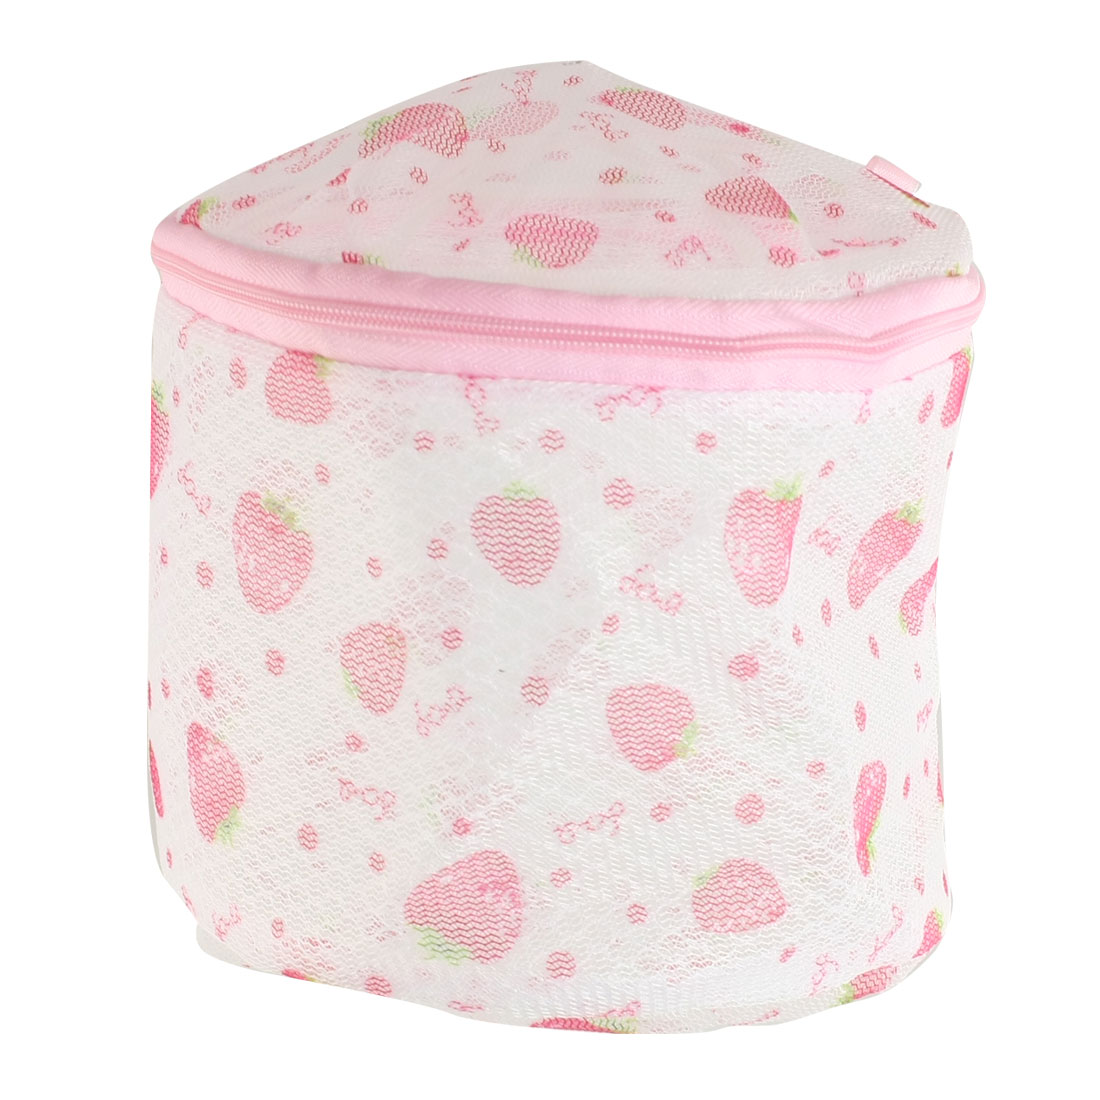 Unique Bargains Nylon Strawberry Pattern Zipper Mesh Laundry Underwear Washing Bag